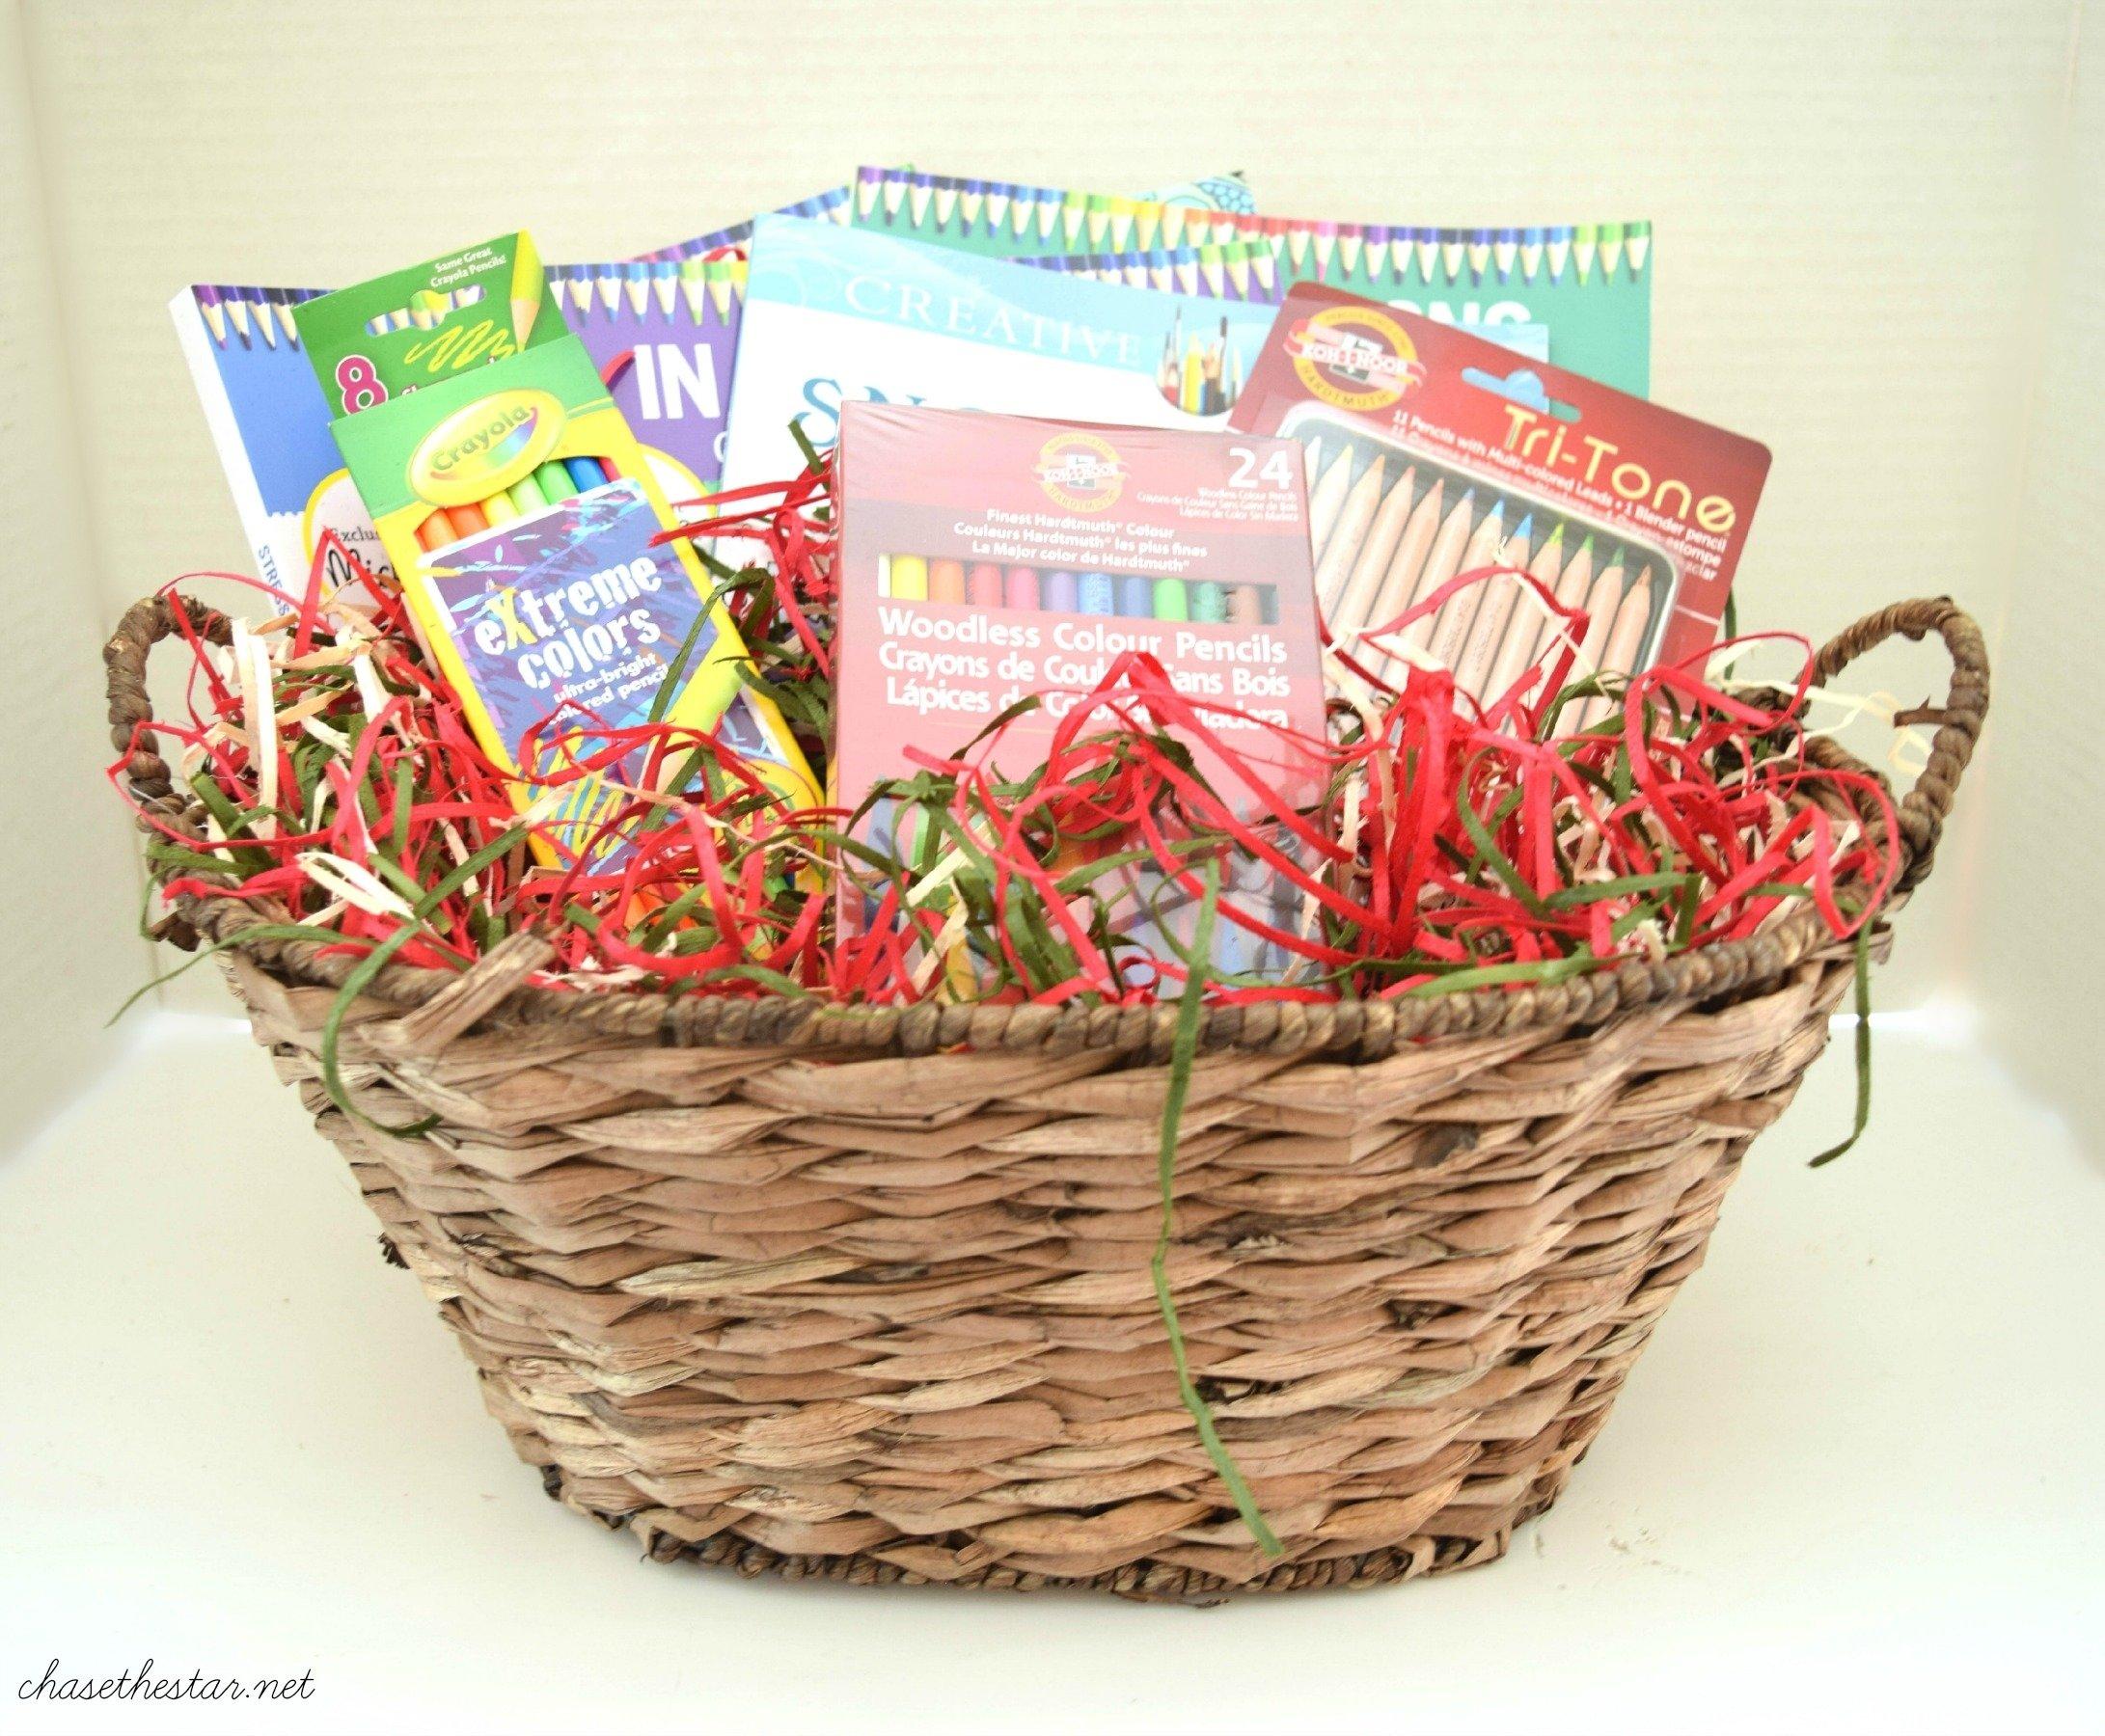 10 Fashionable Ideas For A Gift Basket 3 diy gift basket ideas 2 2020